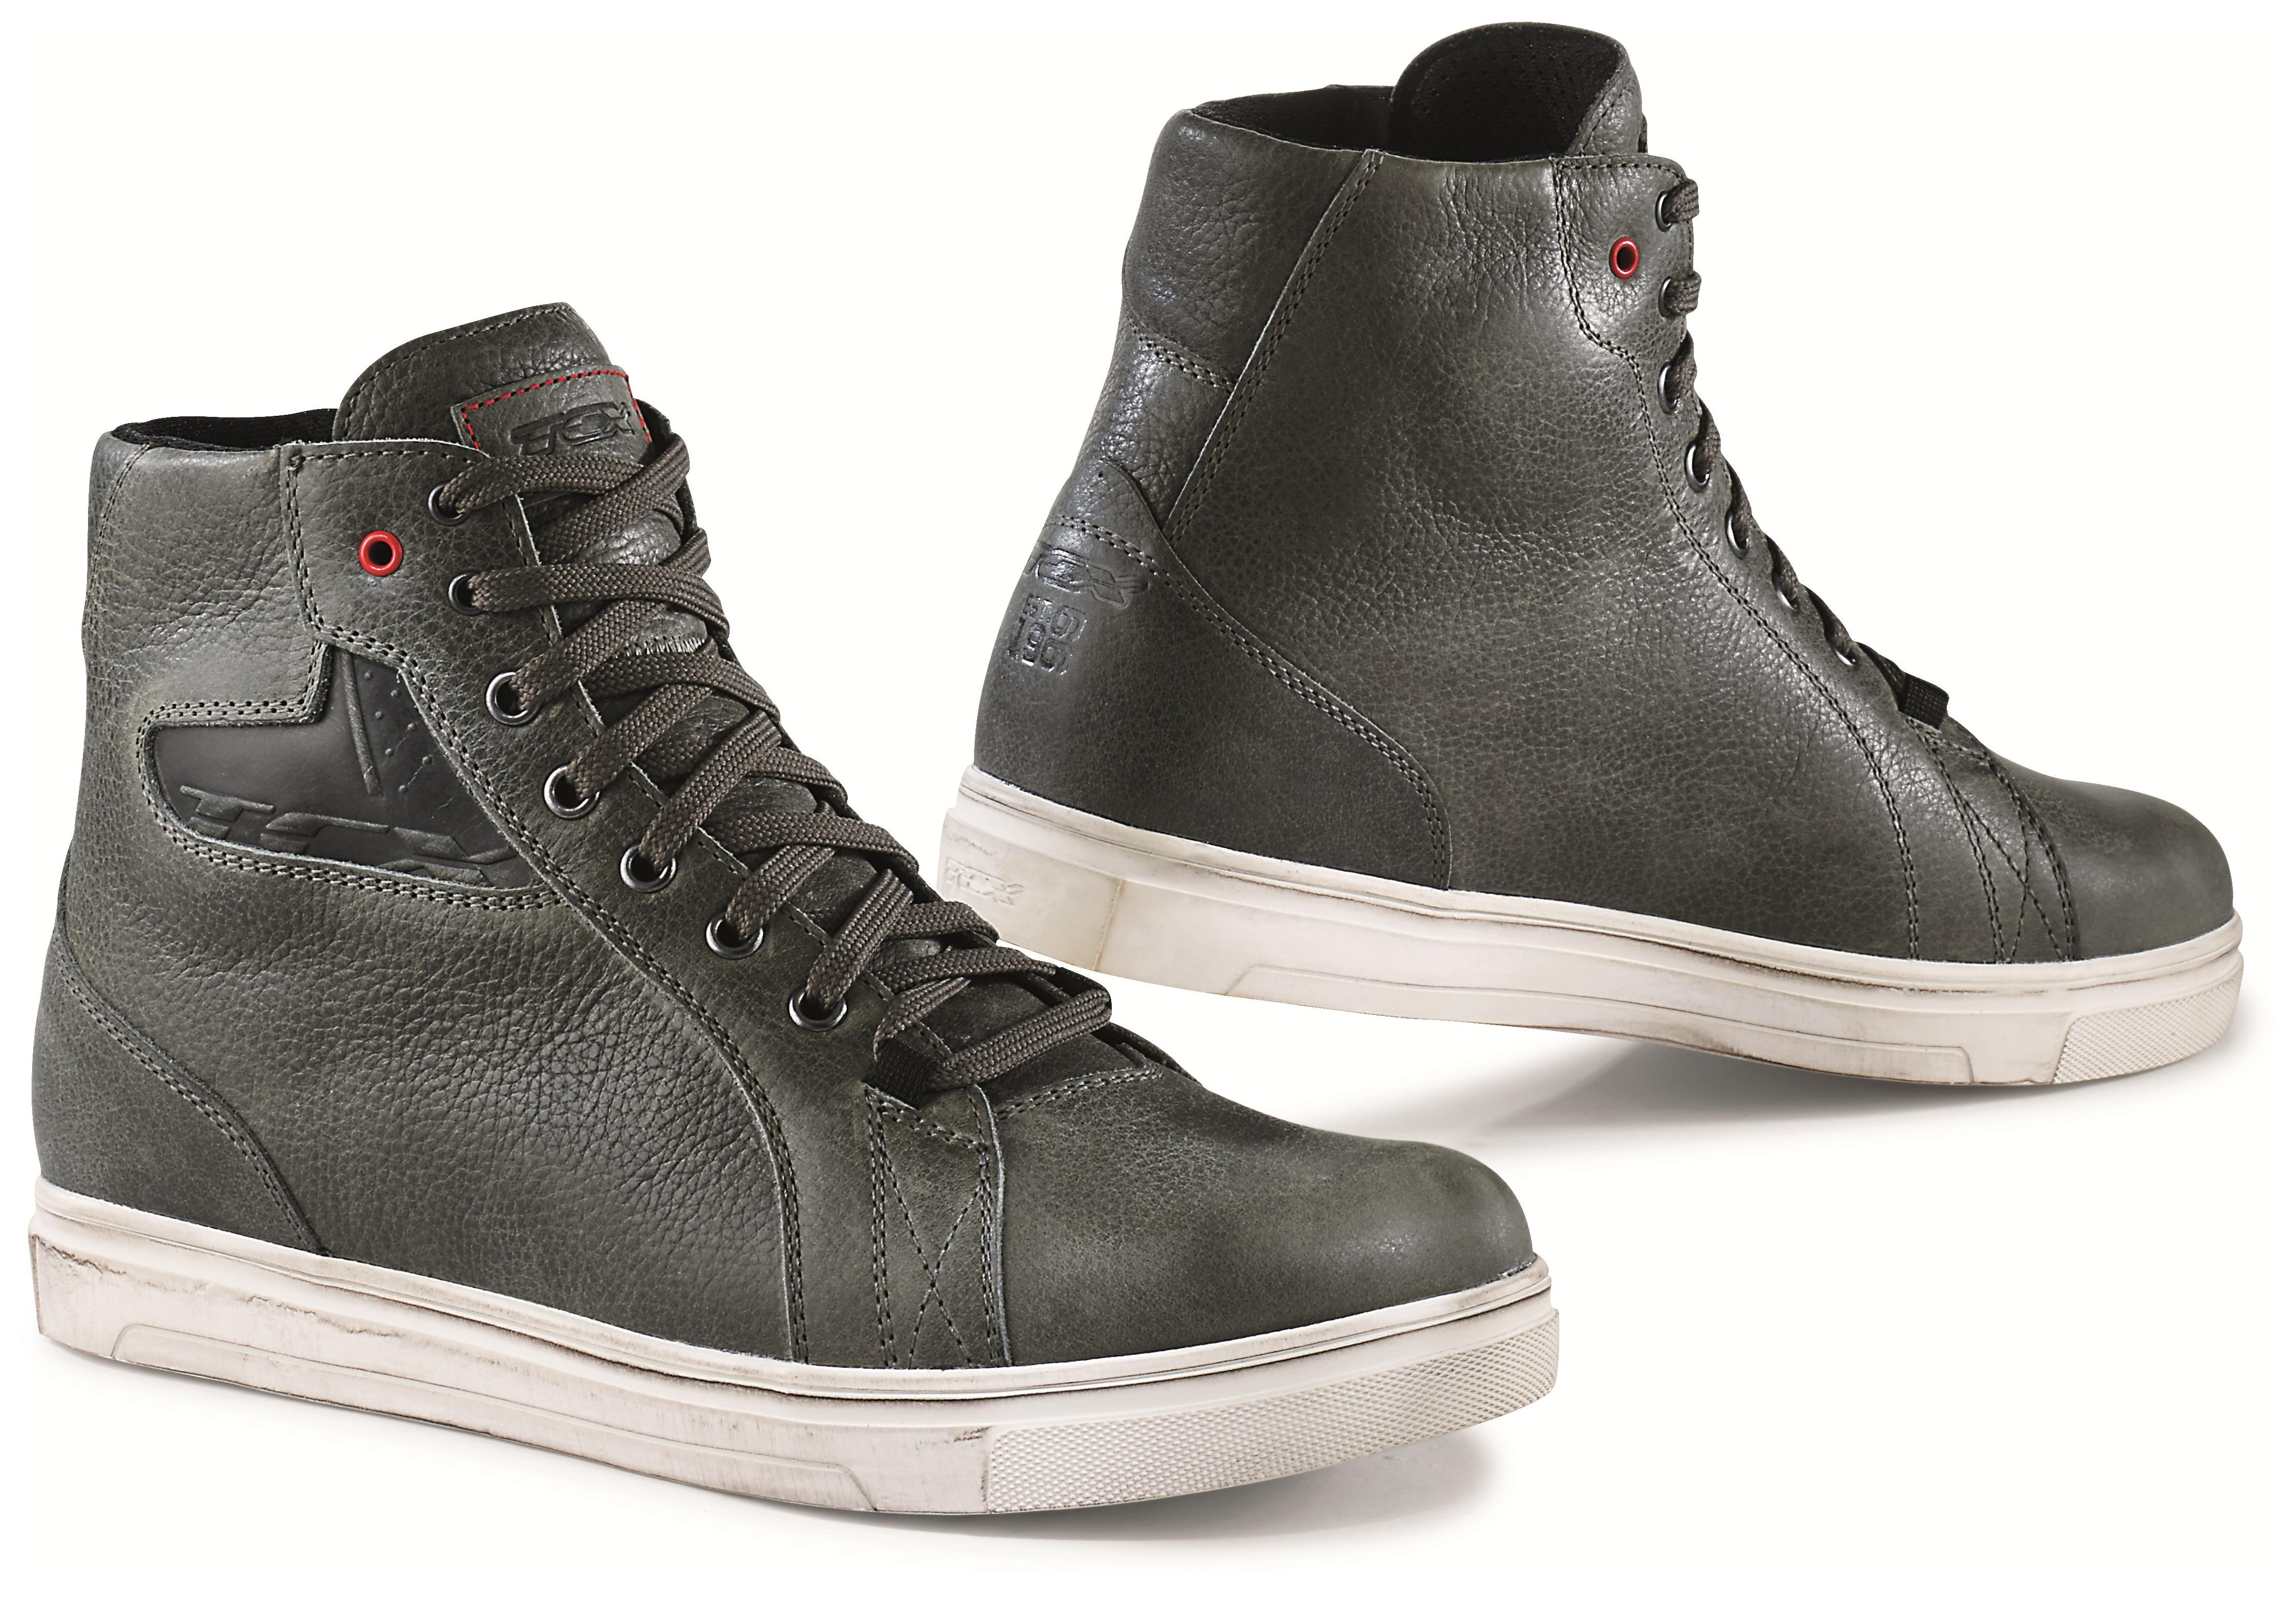 dd0a031906 TCX Street Ace WP Shoes - RevZilla